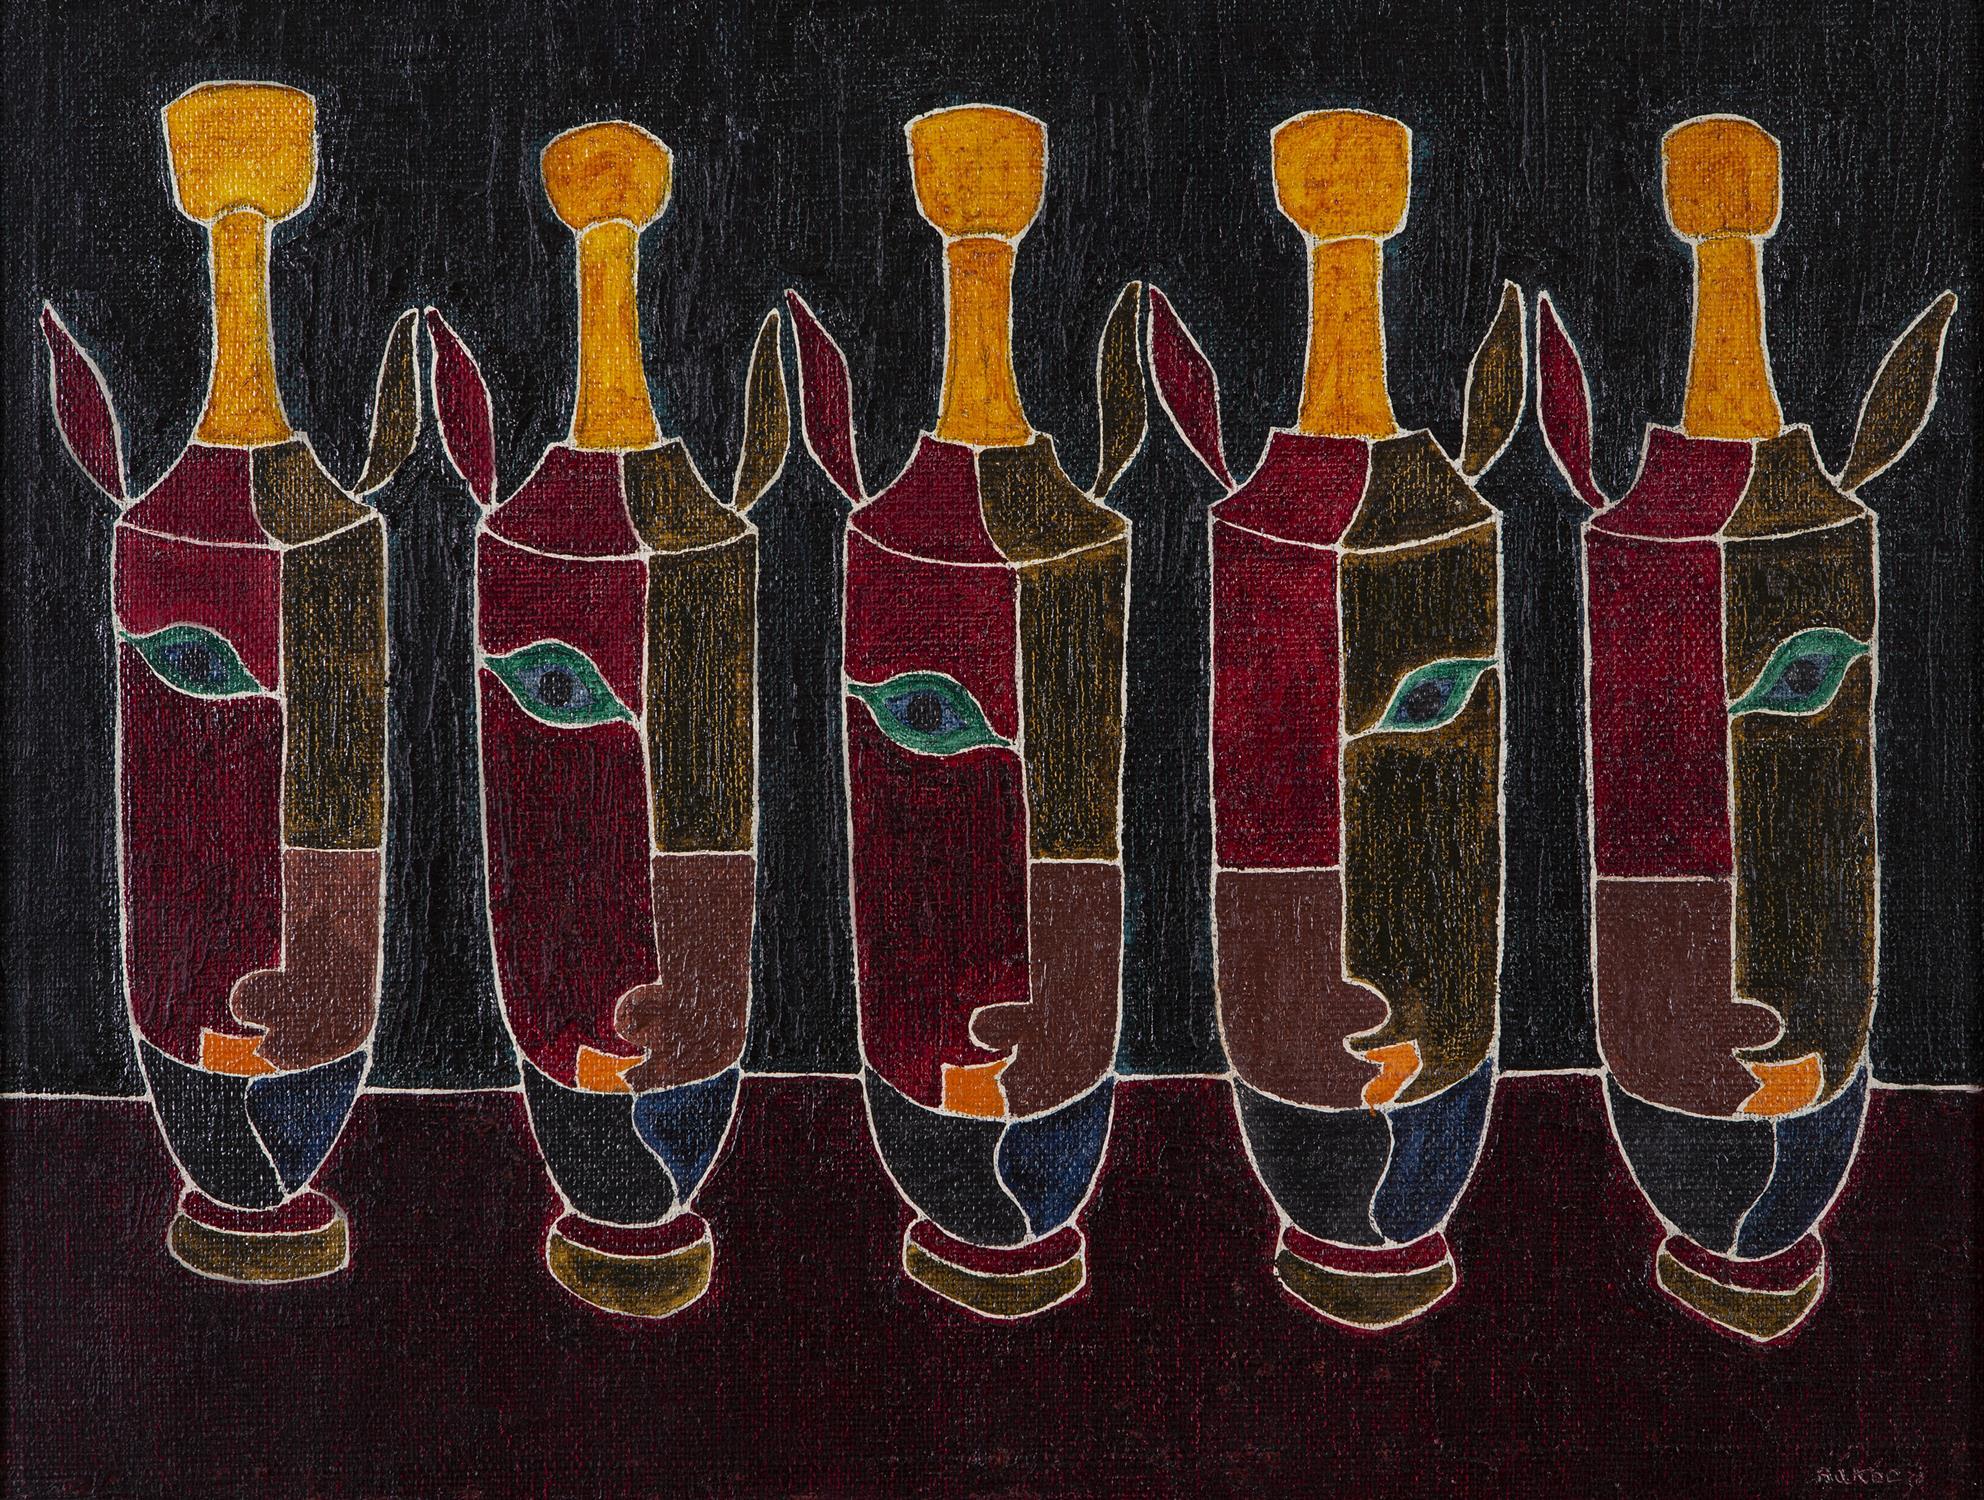 Basil Ivan Rákóczi (1908-1979) Funeraires (Funeral Urns) Oil on canvas, 41 x 61cm (16 x